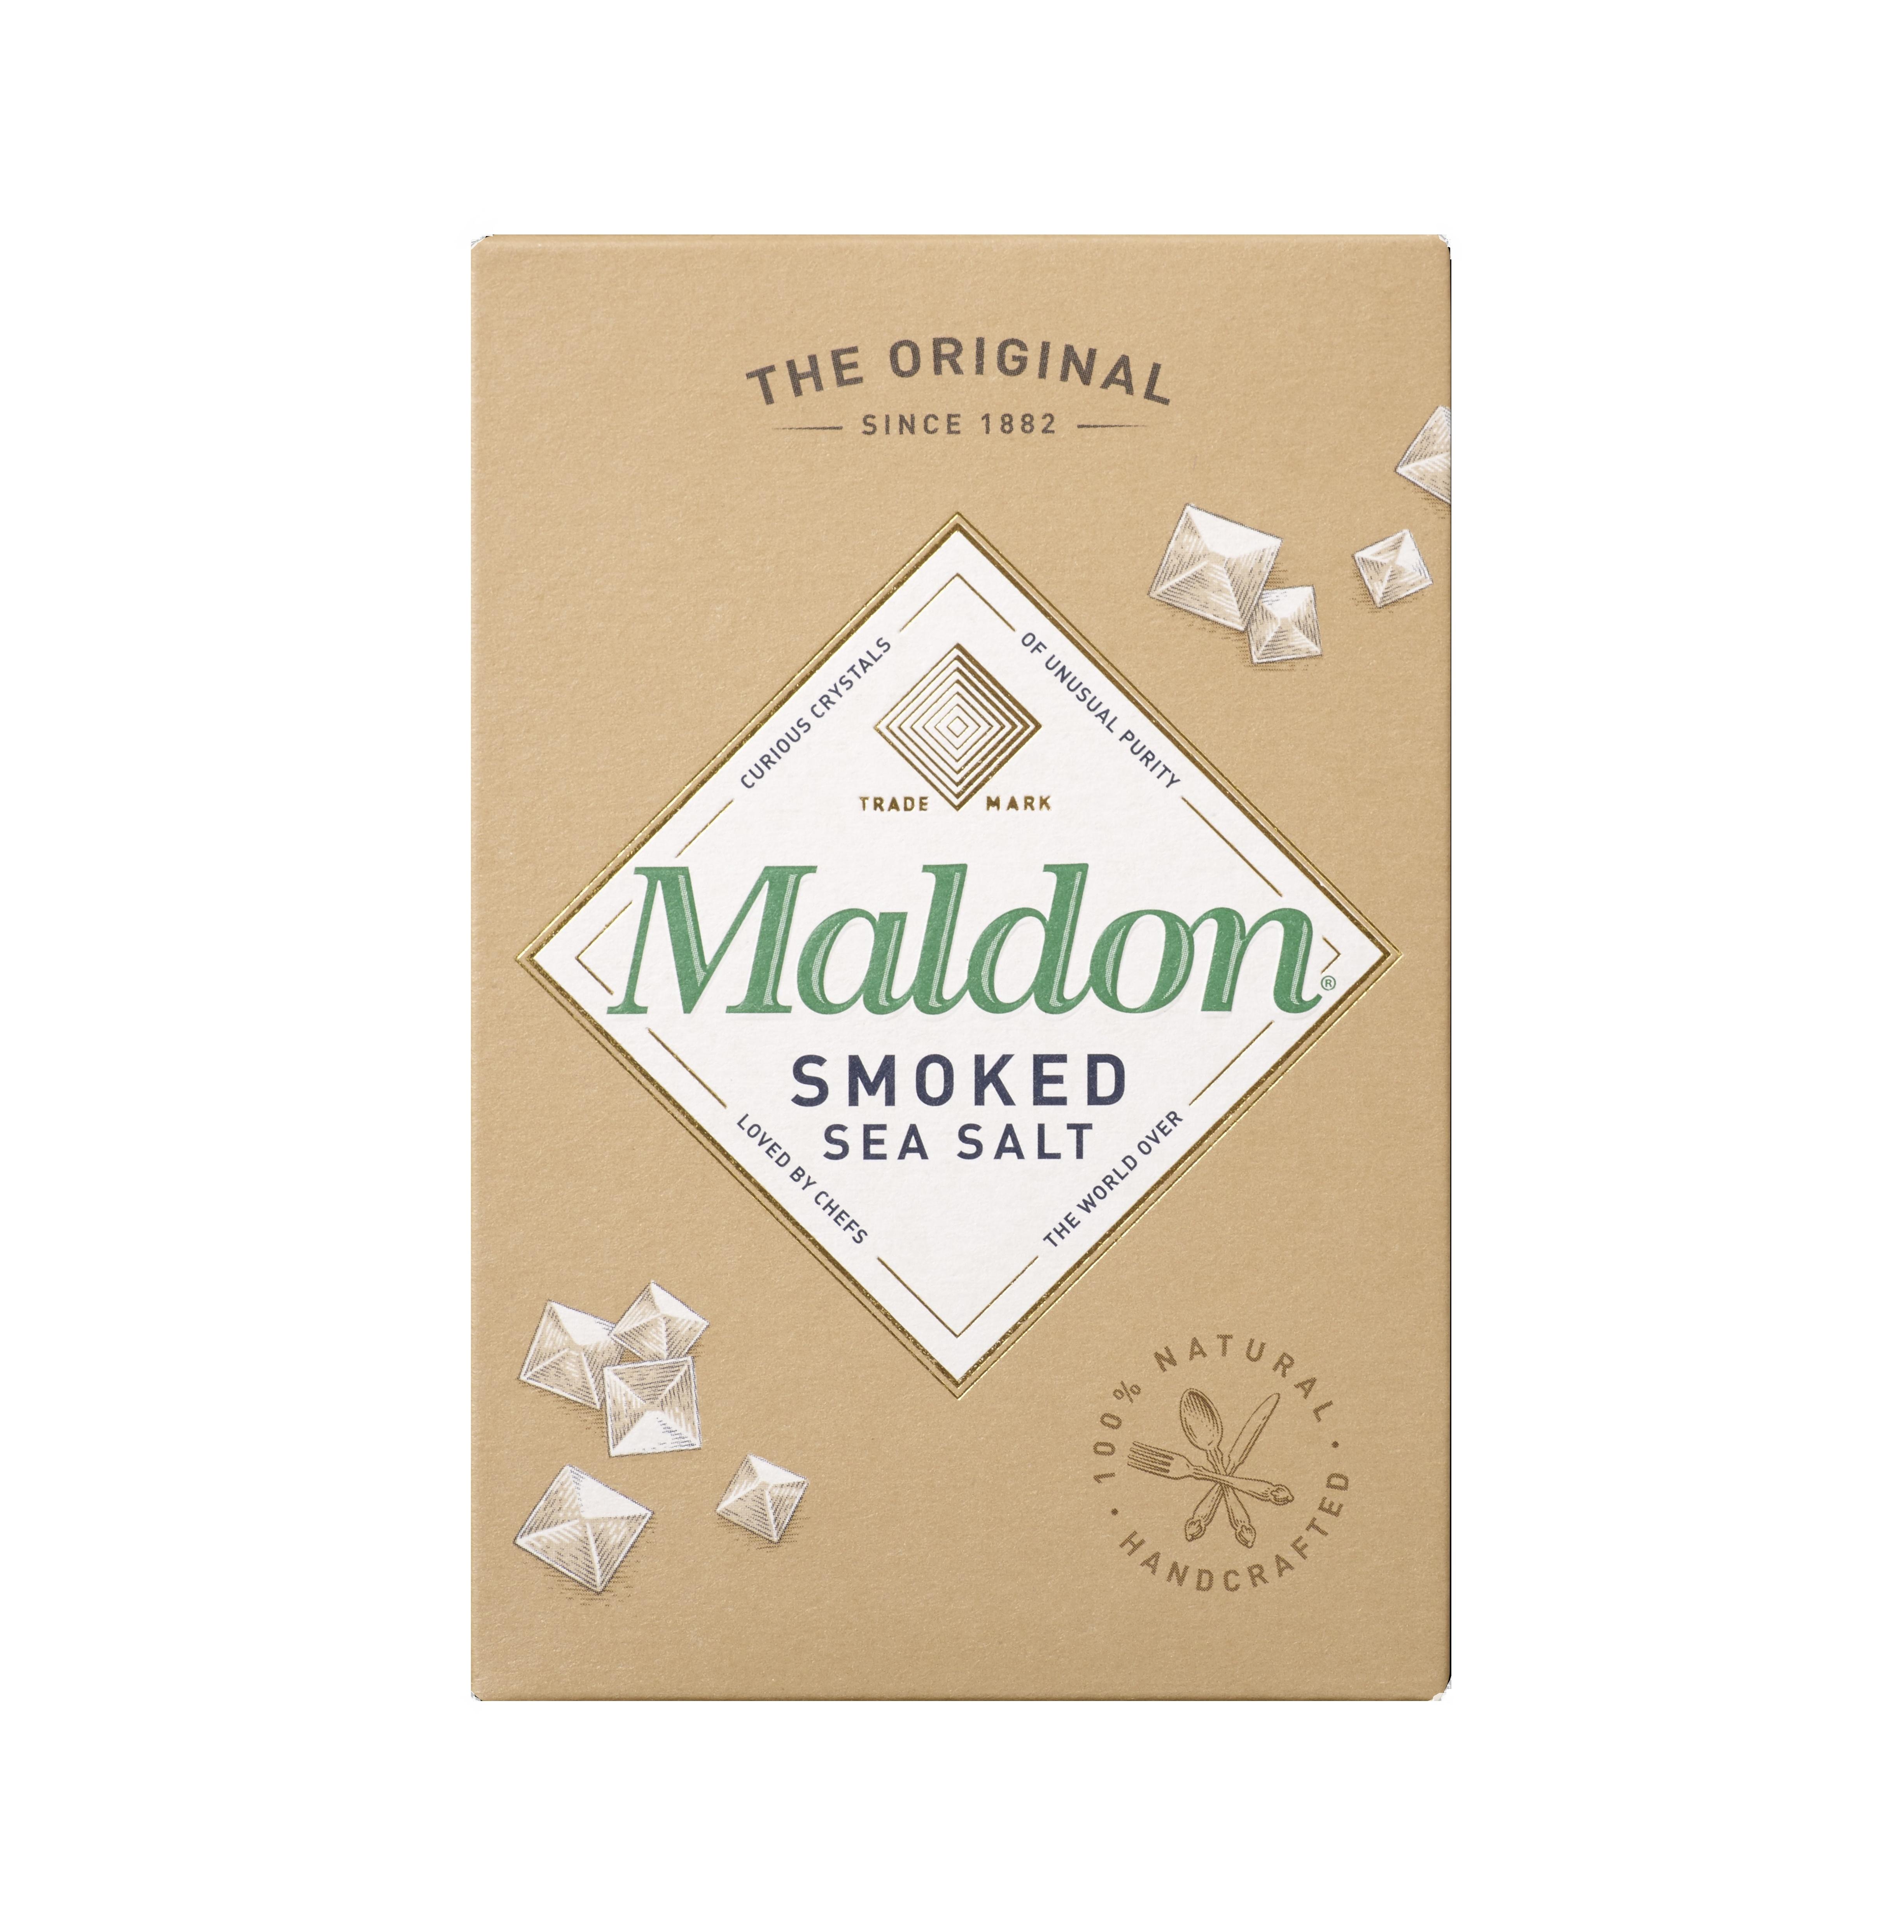 Maldon Smoked